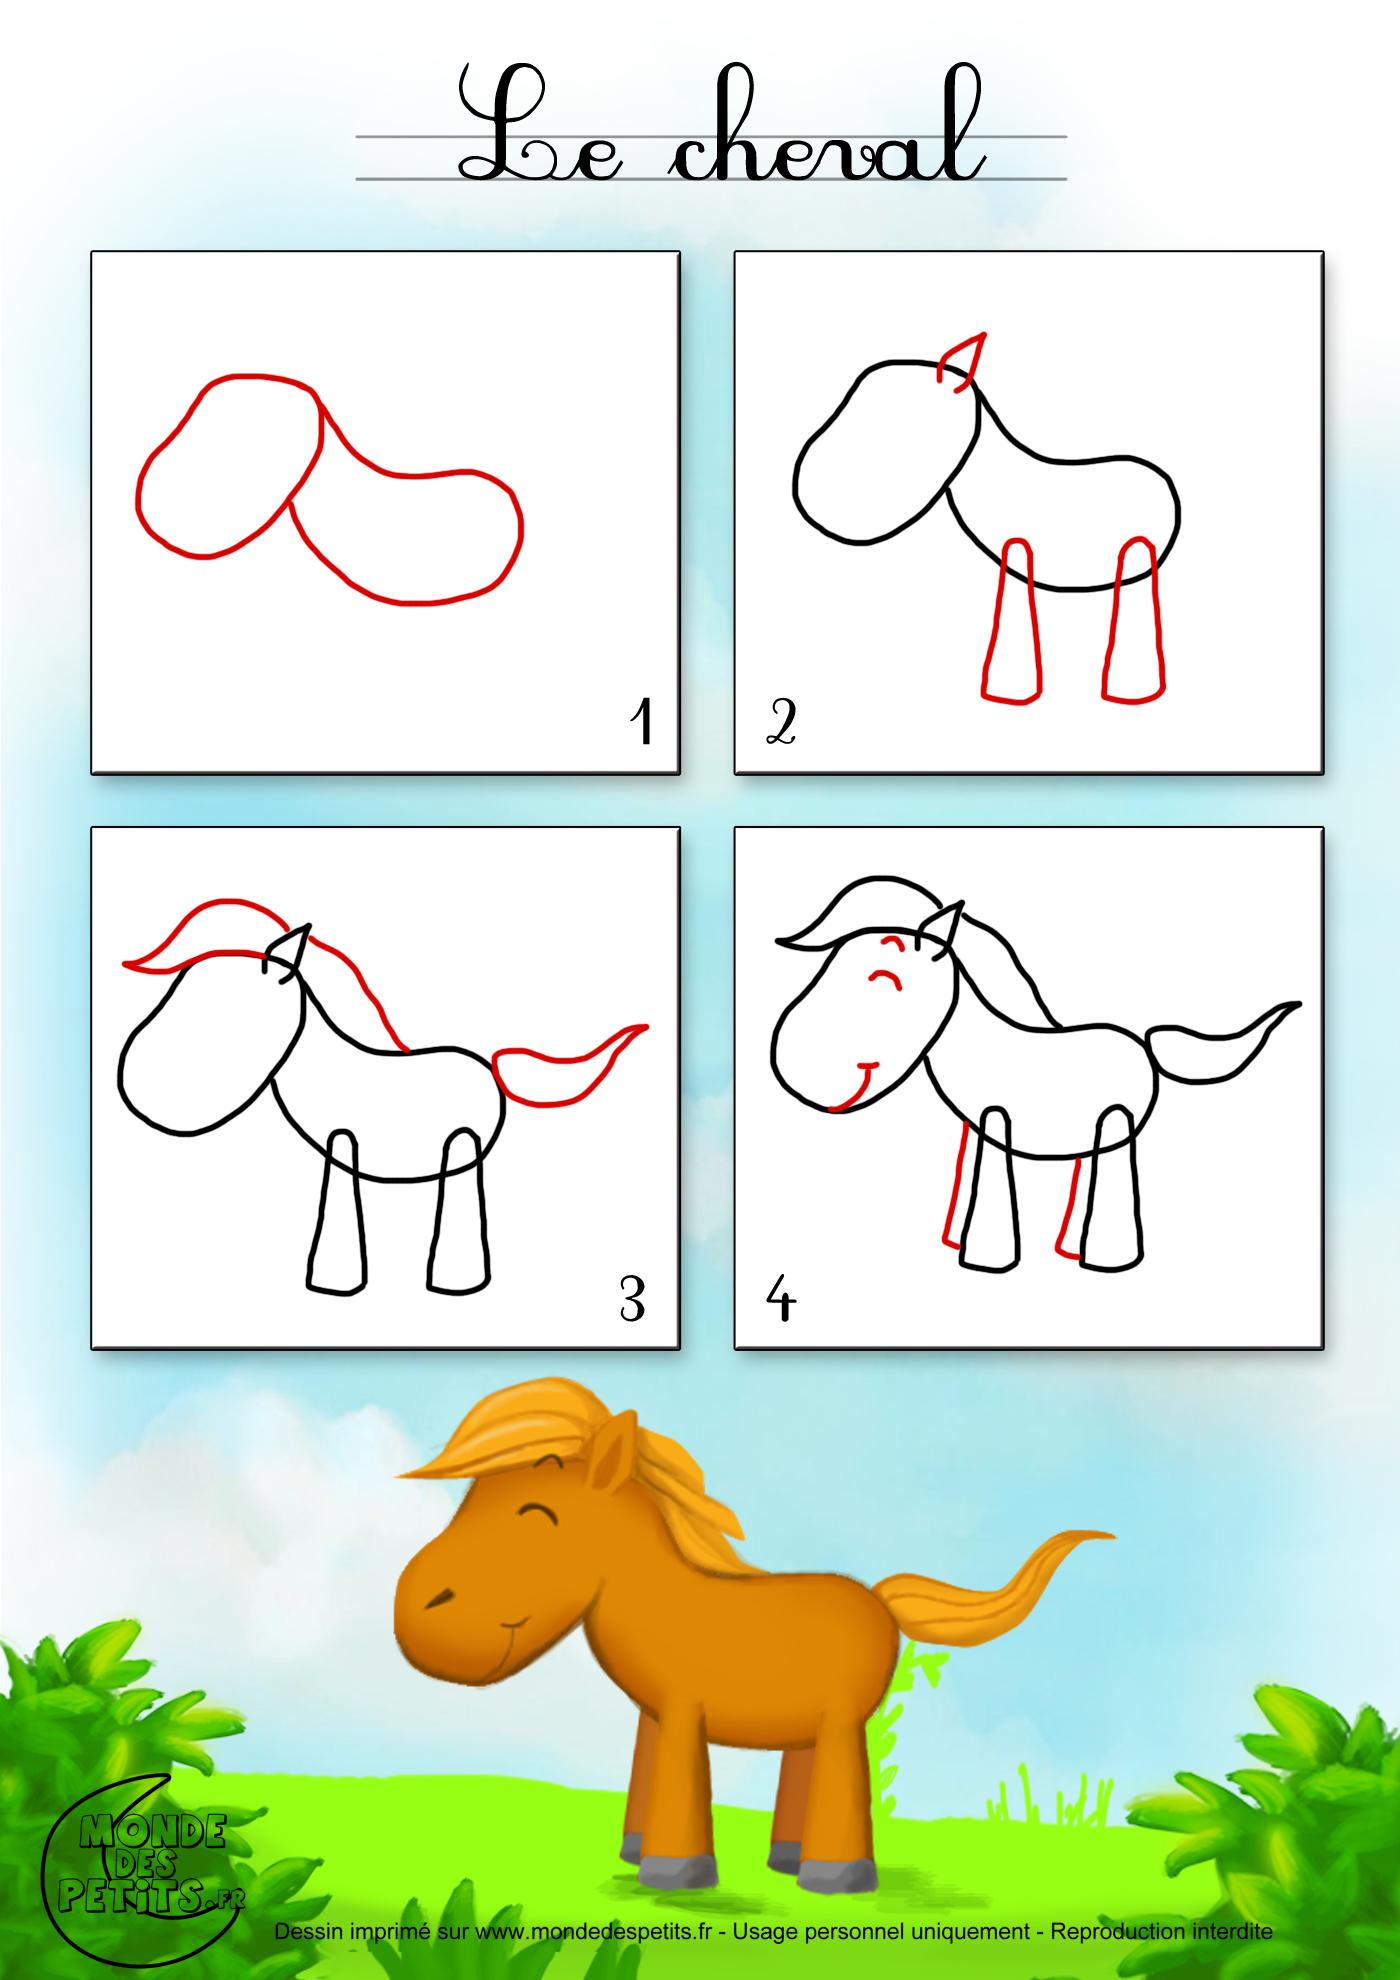 Dessin cheval on pinterest dessin dessin de cheval and - Apprendre dessiner cheval ...